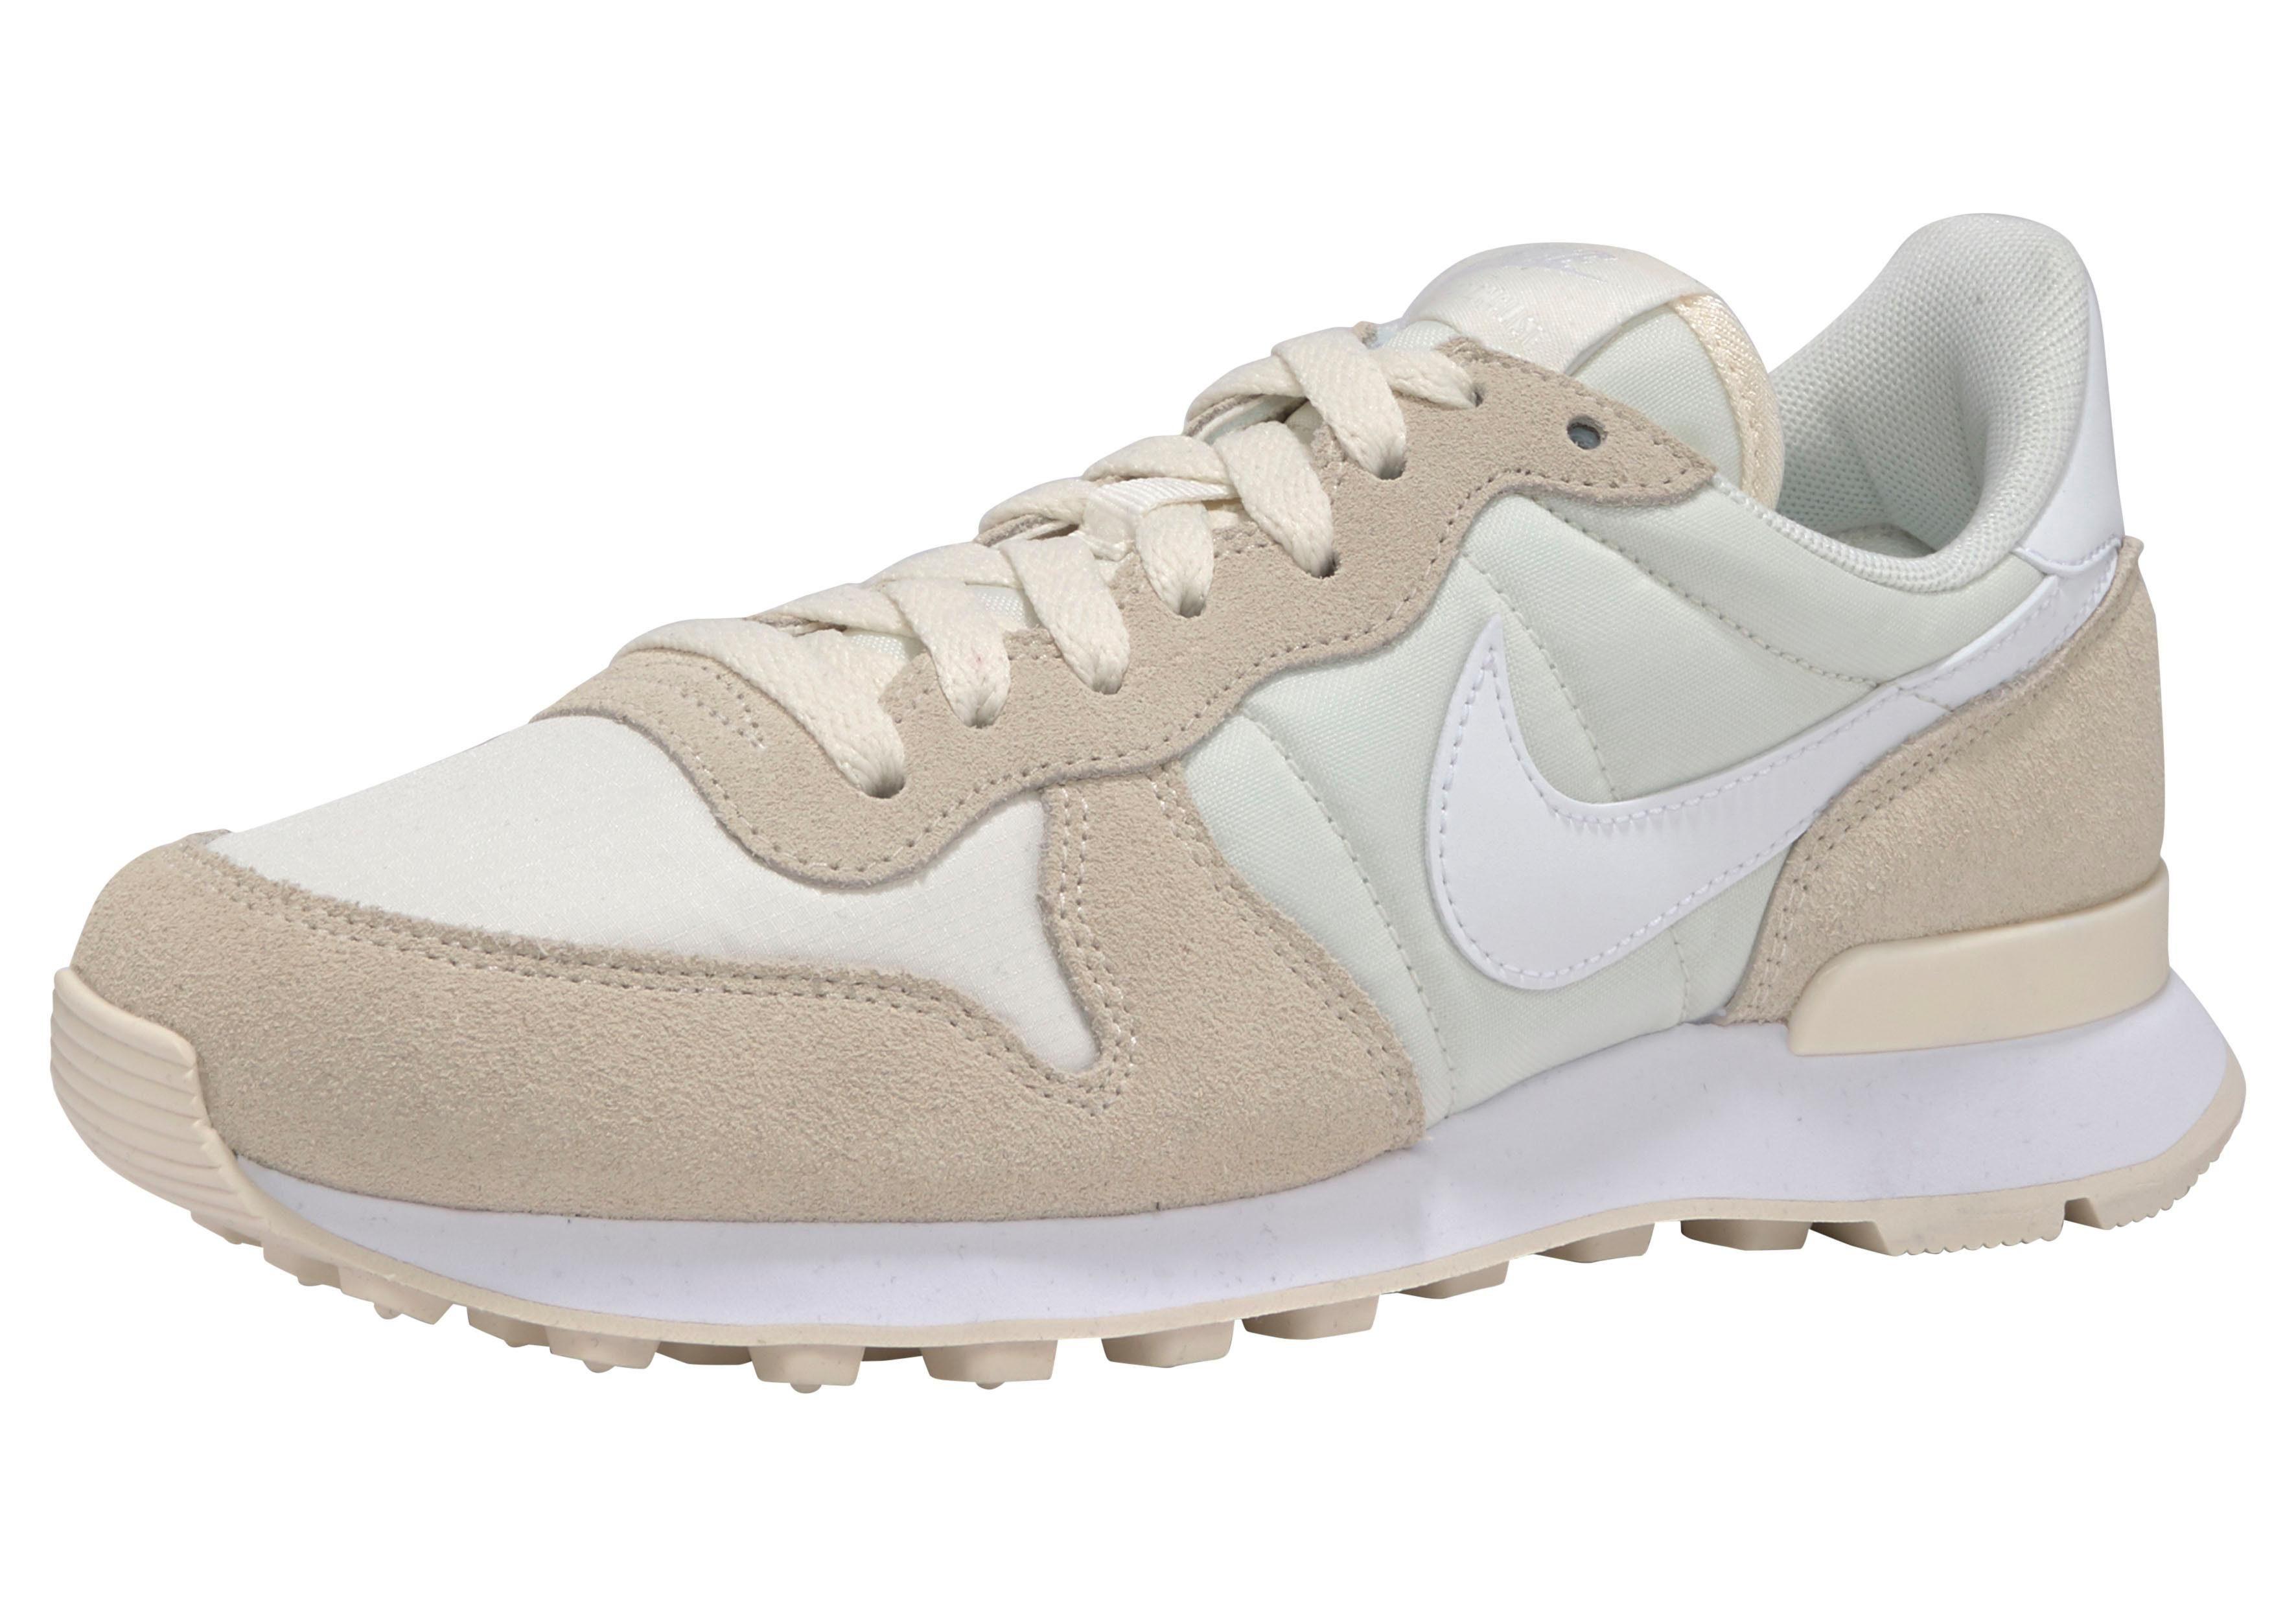 Nike Internationalist« Internationalist« Nike Sportswear »wmns Sportswear »wmns Sportswear Internationalist« SneakerOtto »wmns Nike SneakerOtto 3T1JKlFuc